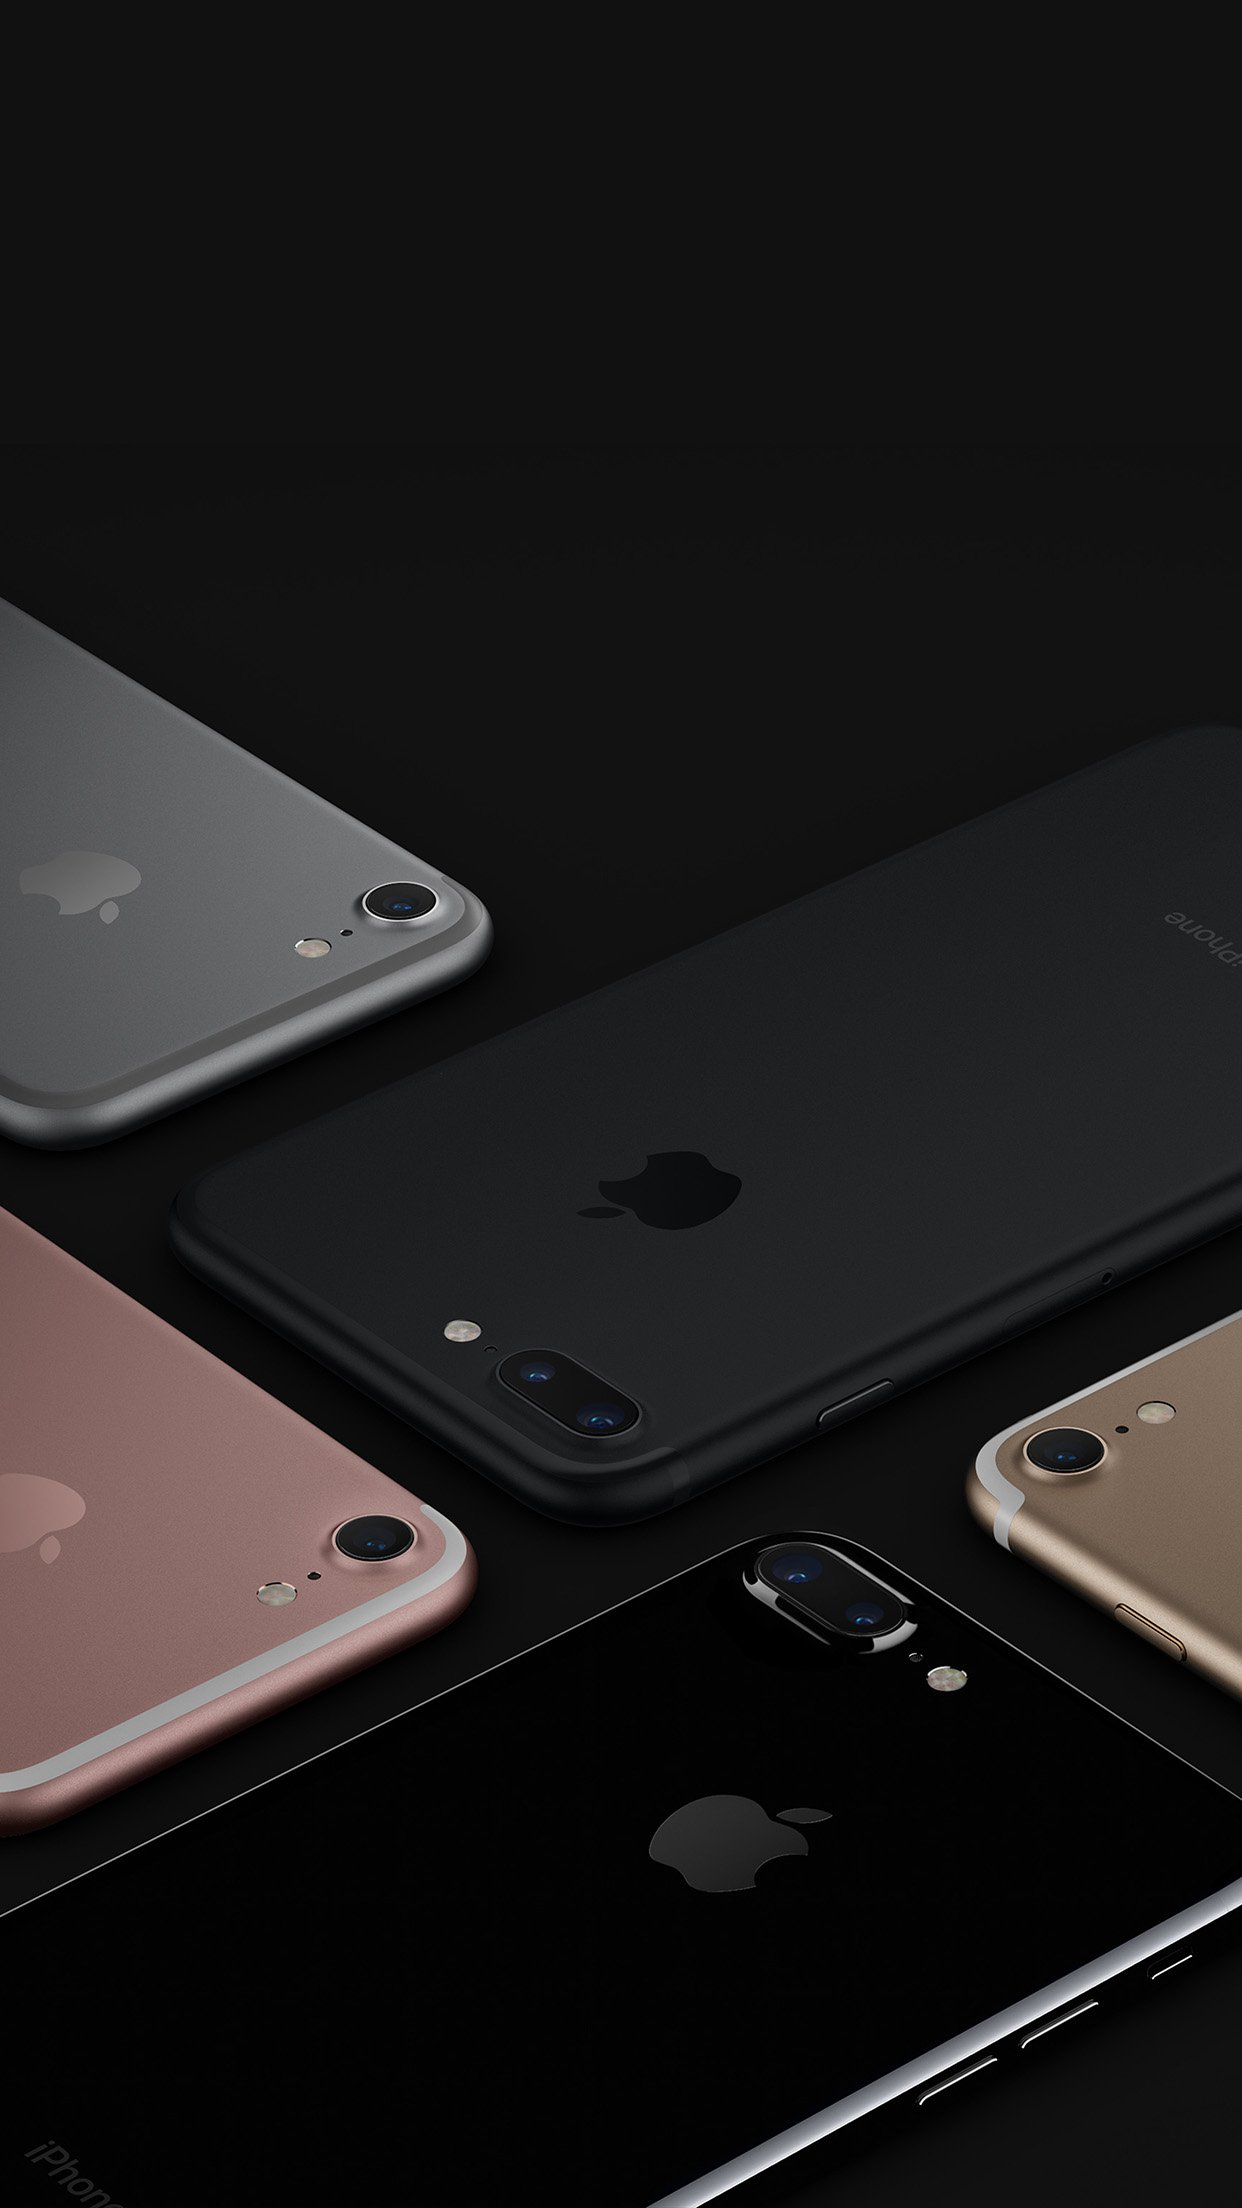 iPhone 7 iPhone 7 Plus iPhone 7 iPhone 7 Plus Colors 3Wallpapers iPhone Parallax iPhone 7, iPhone 7 Plus Colors